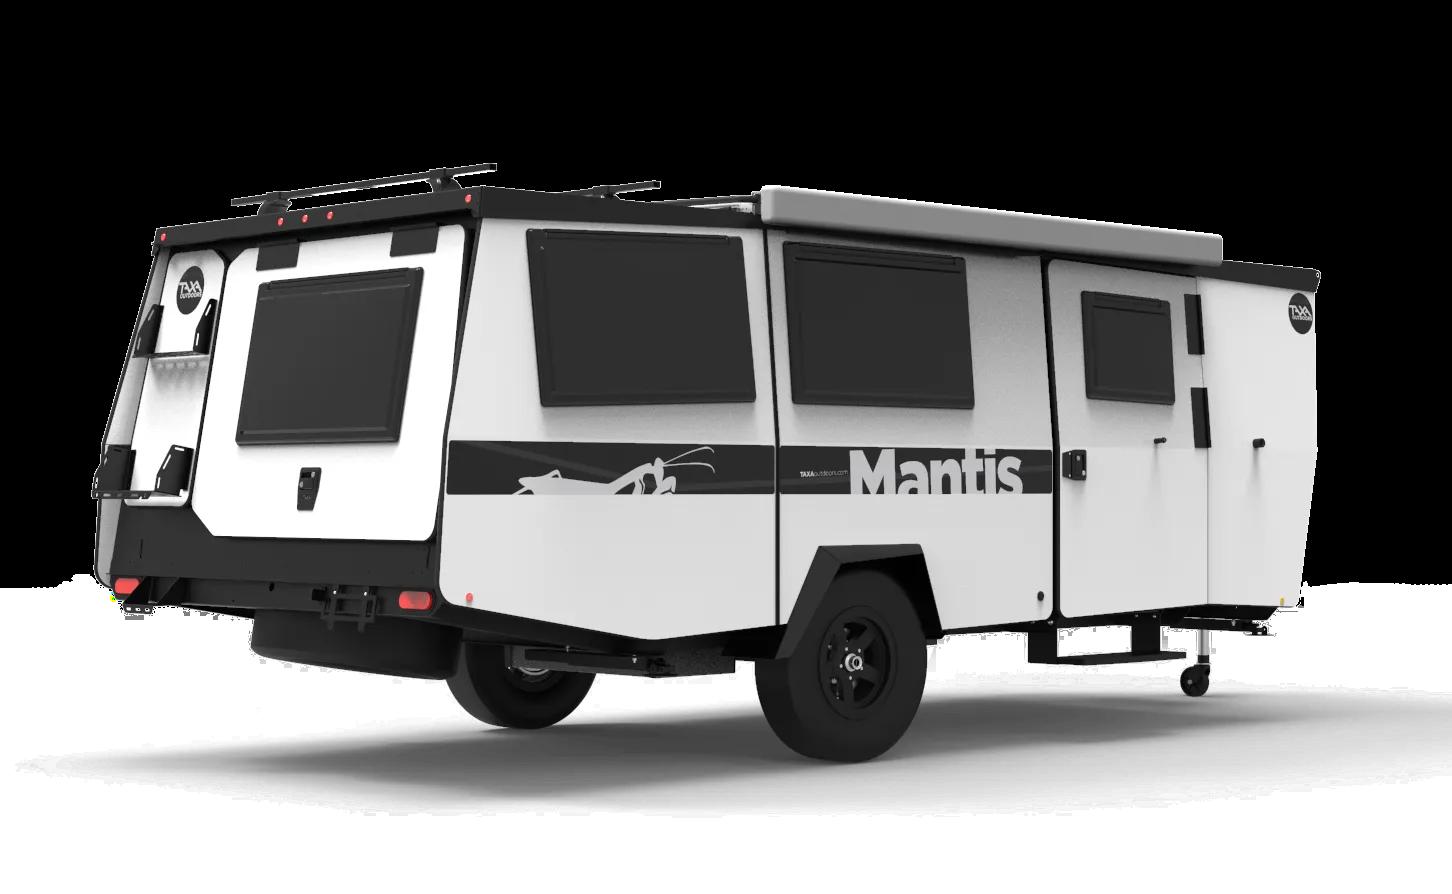 taxa mantis light camper for boondocking camping off road